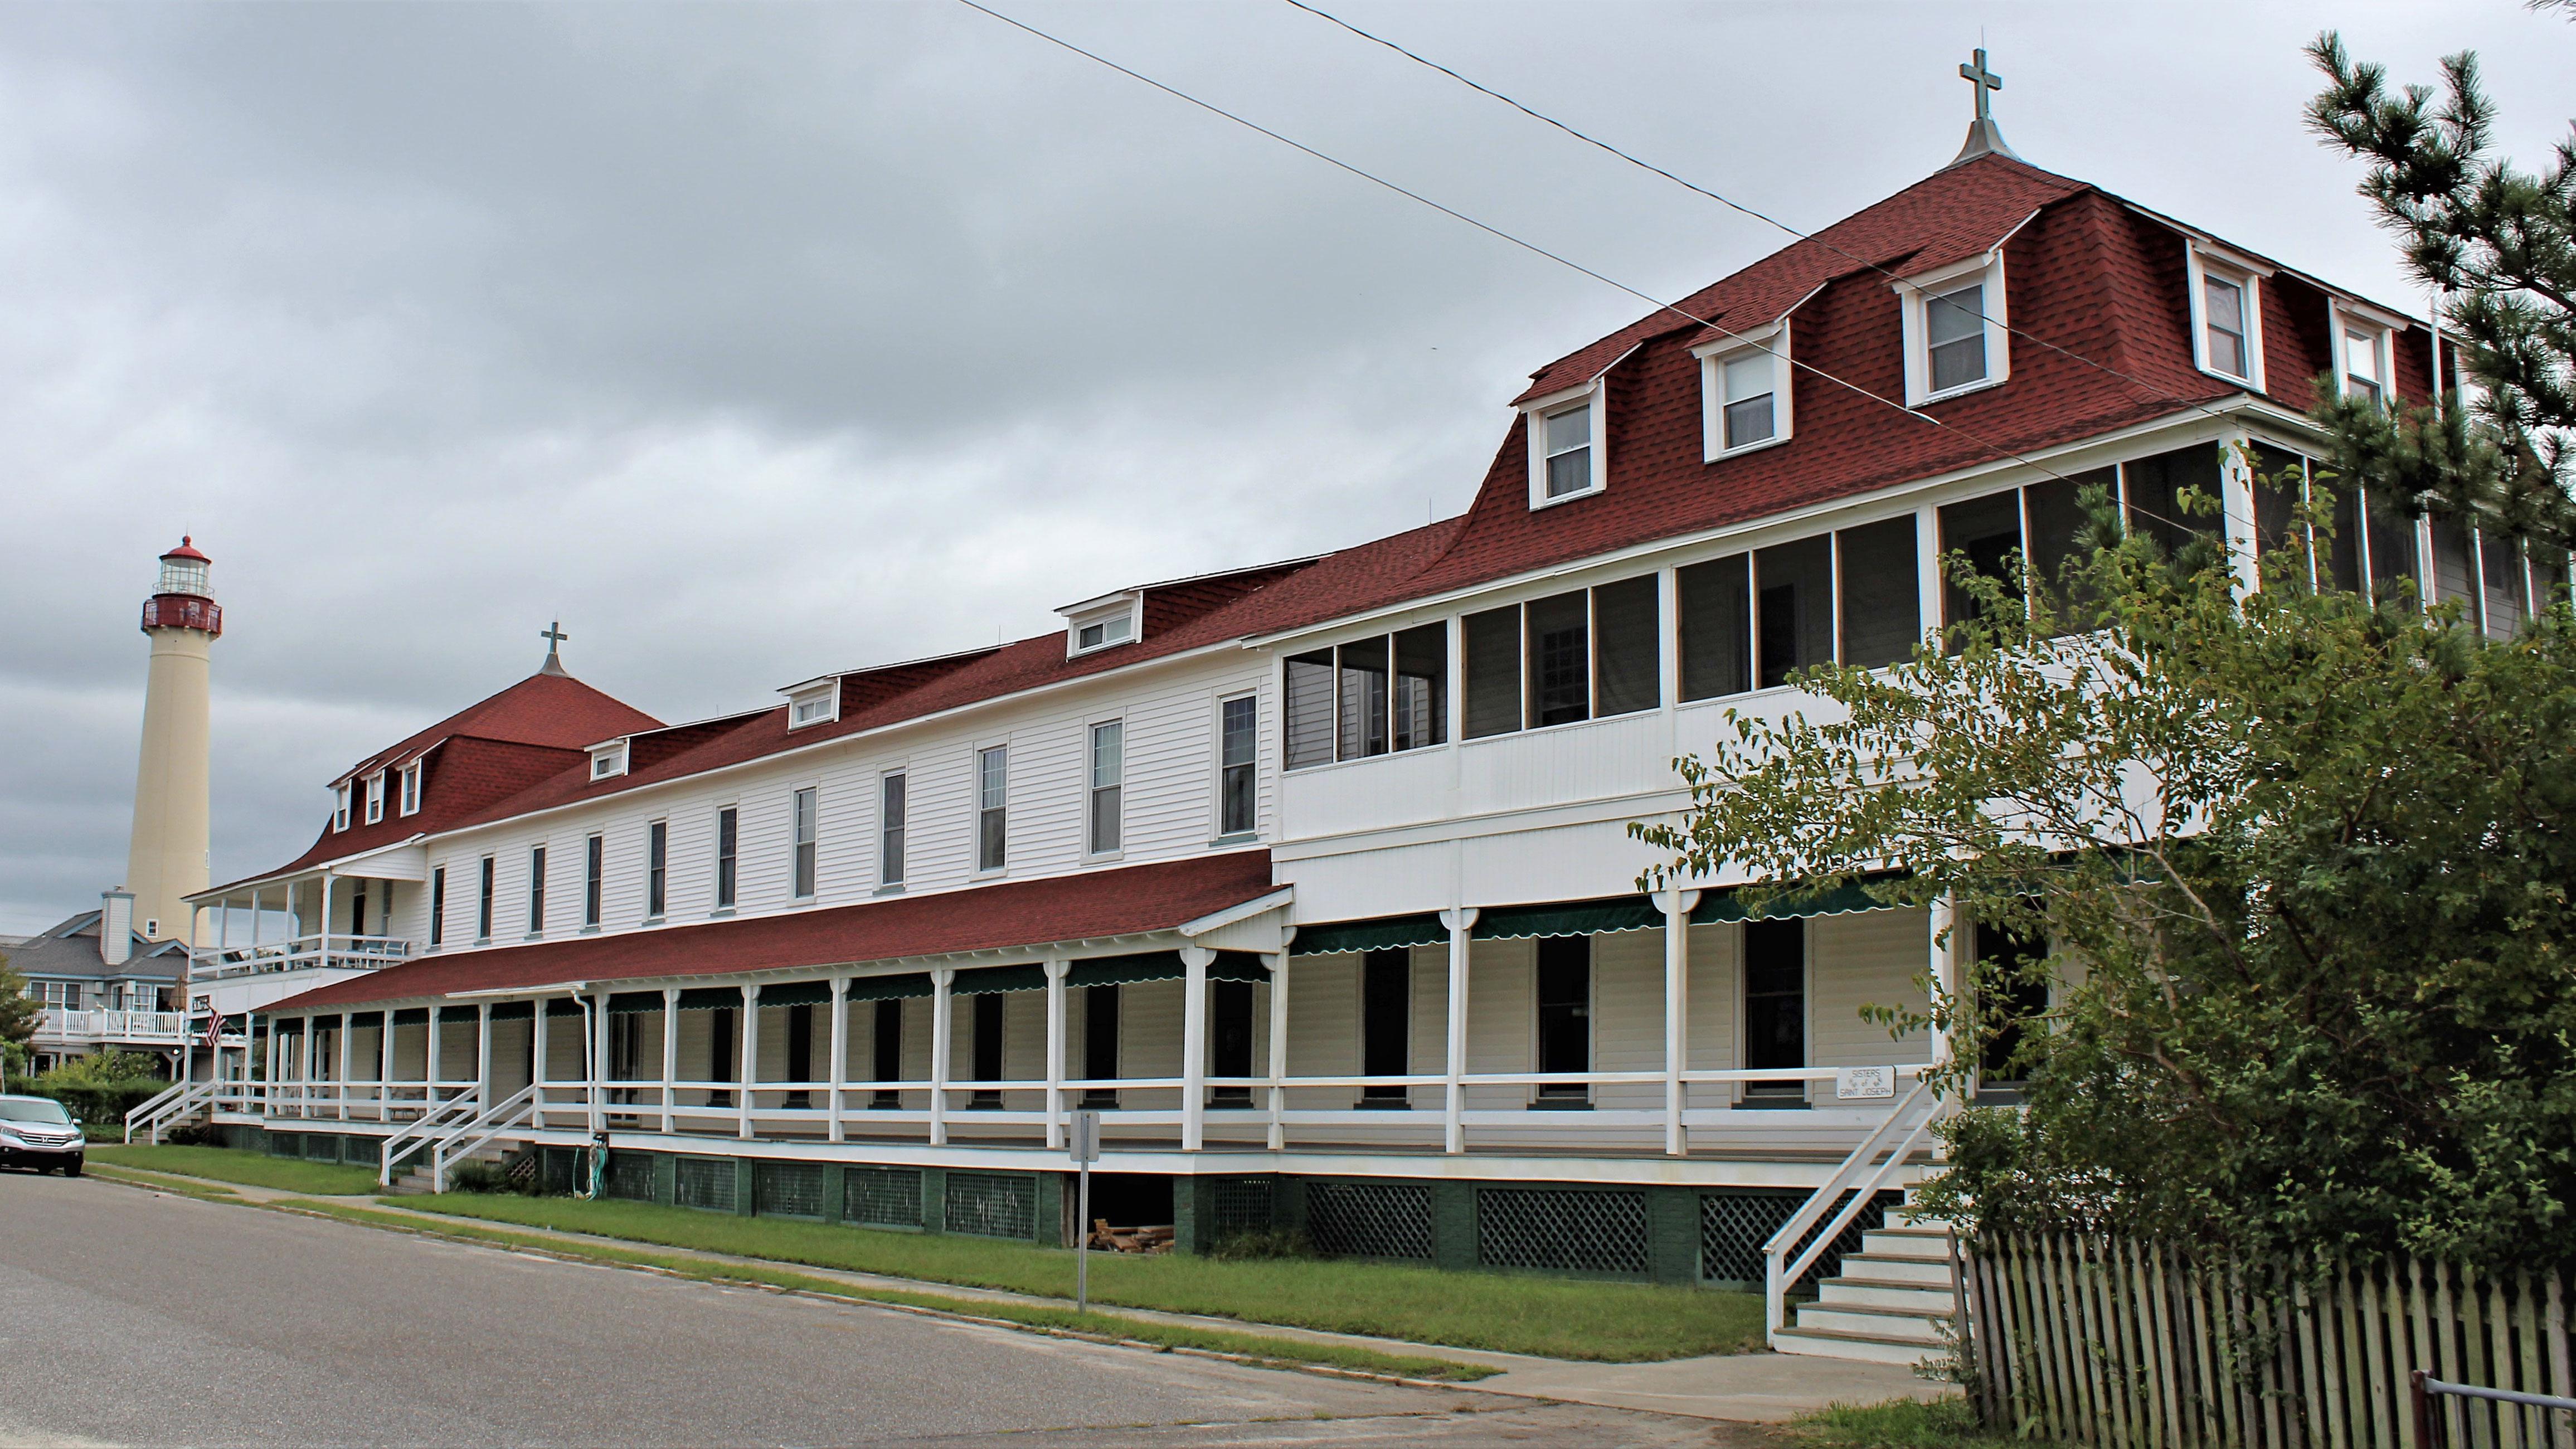 Nuns plan to demolish Cape May Point retreat center : Urban Planning : WHYY